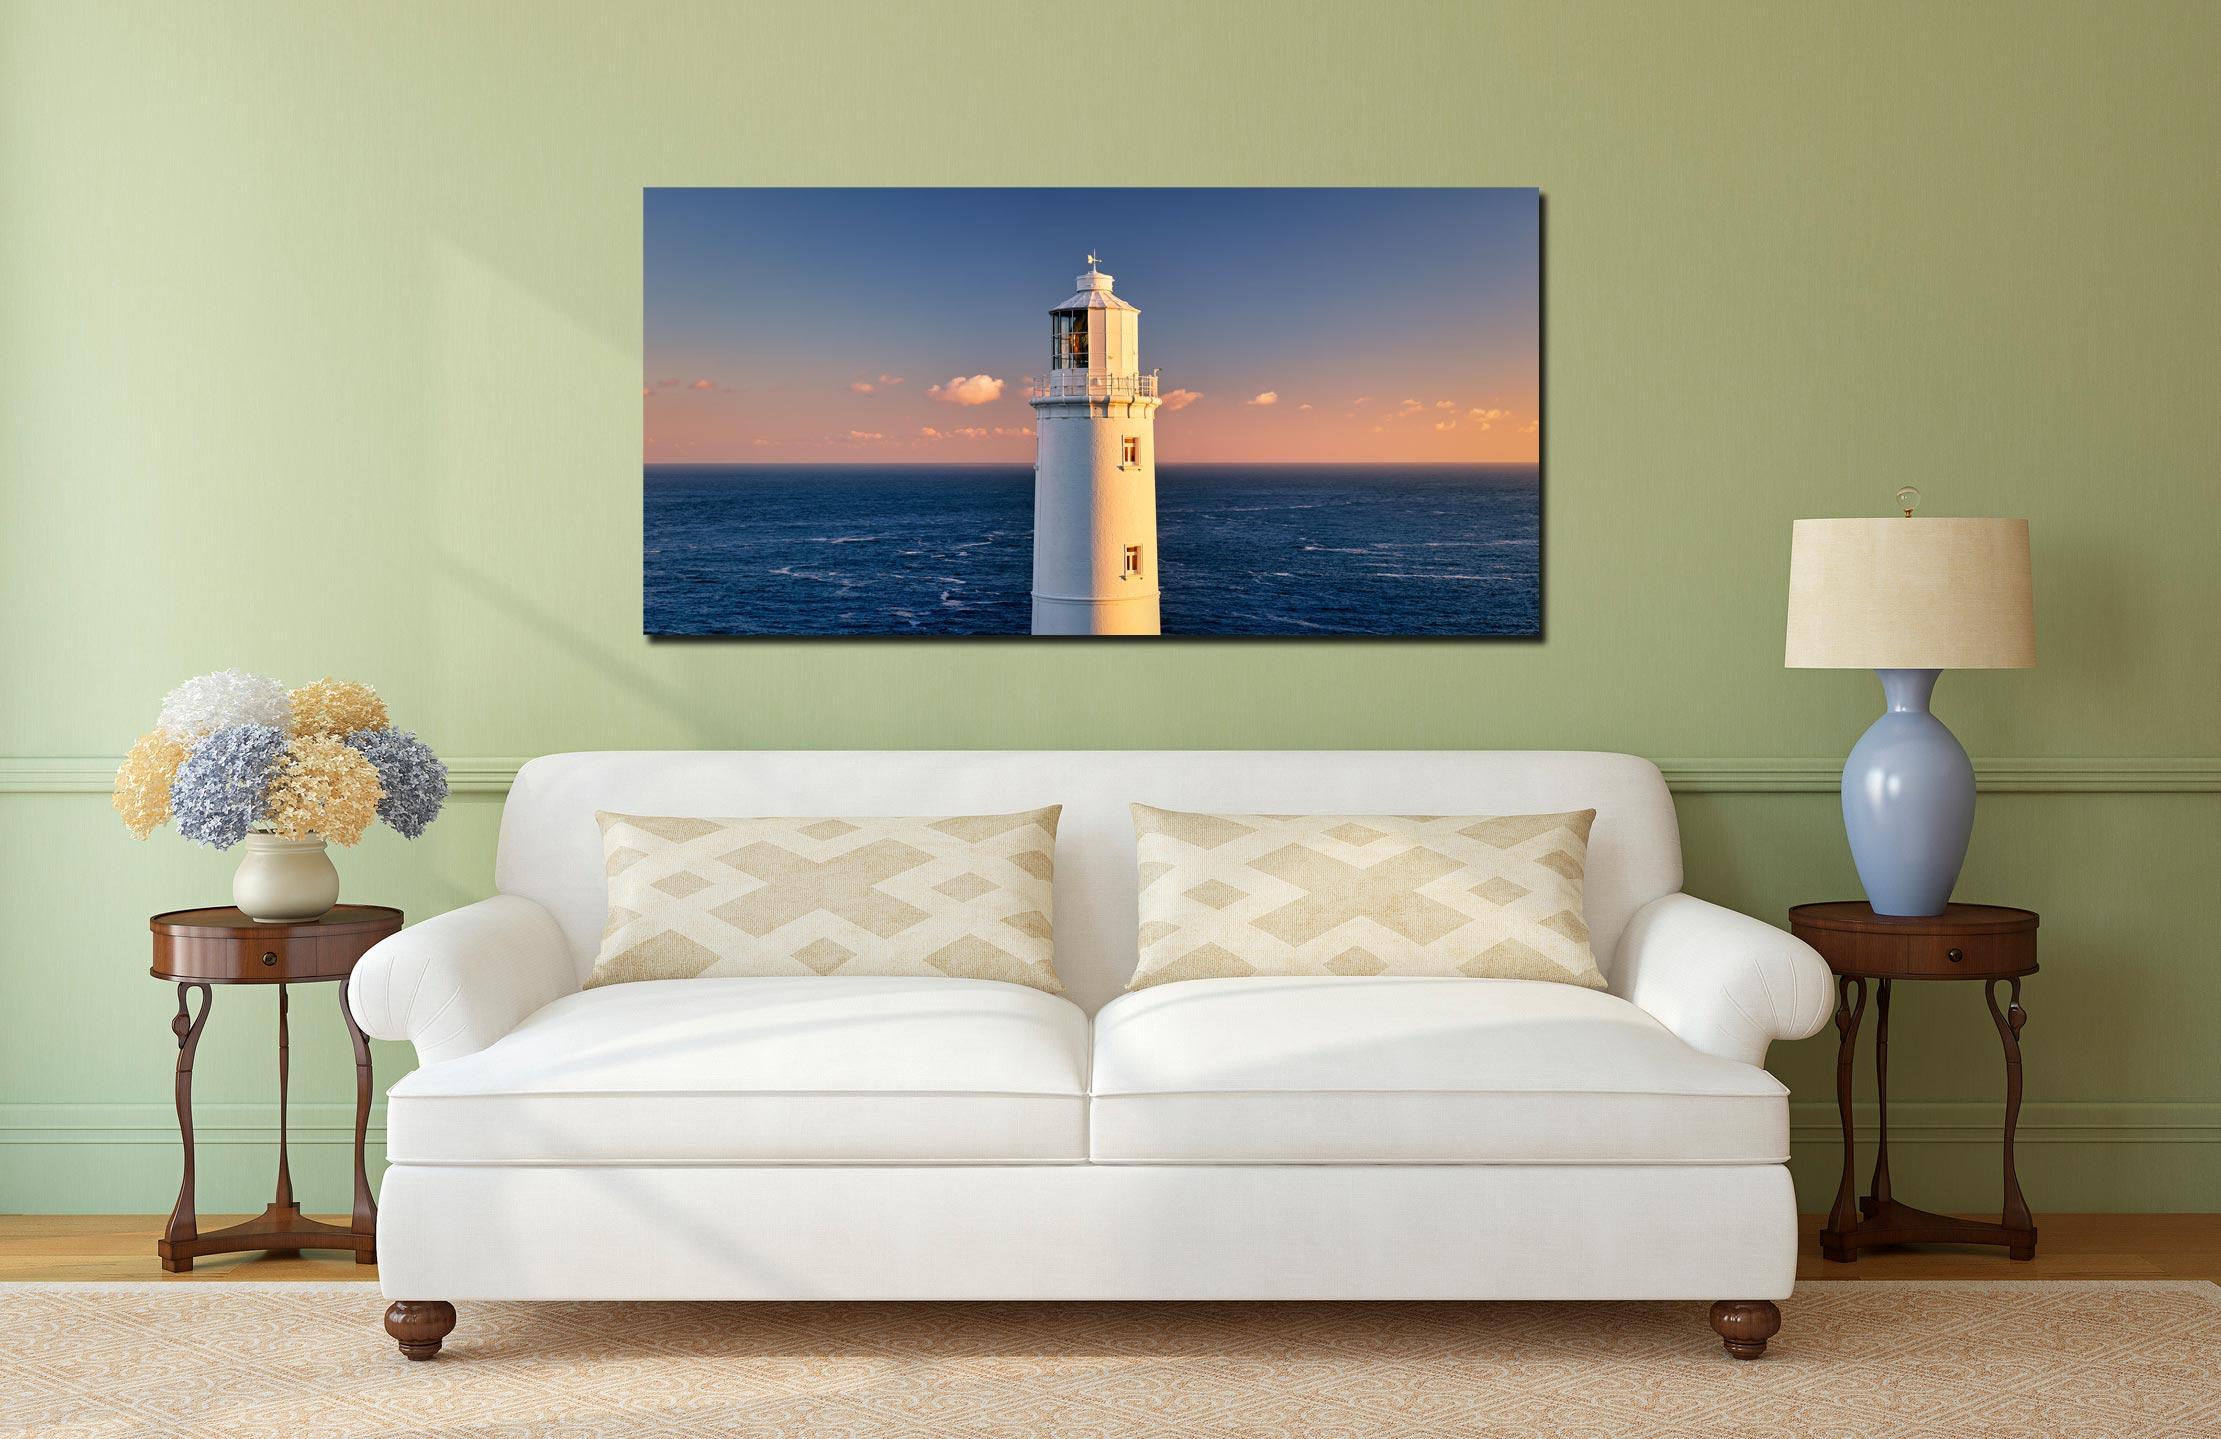 Trevose Head Lighthouse - Print Aluminium Backing With Acrylic Glazing on Wall